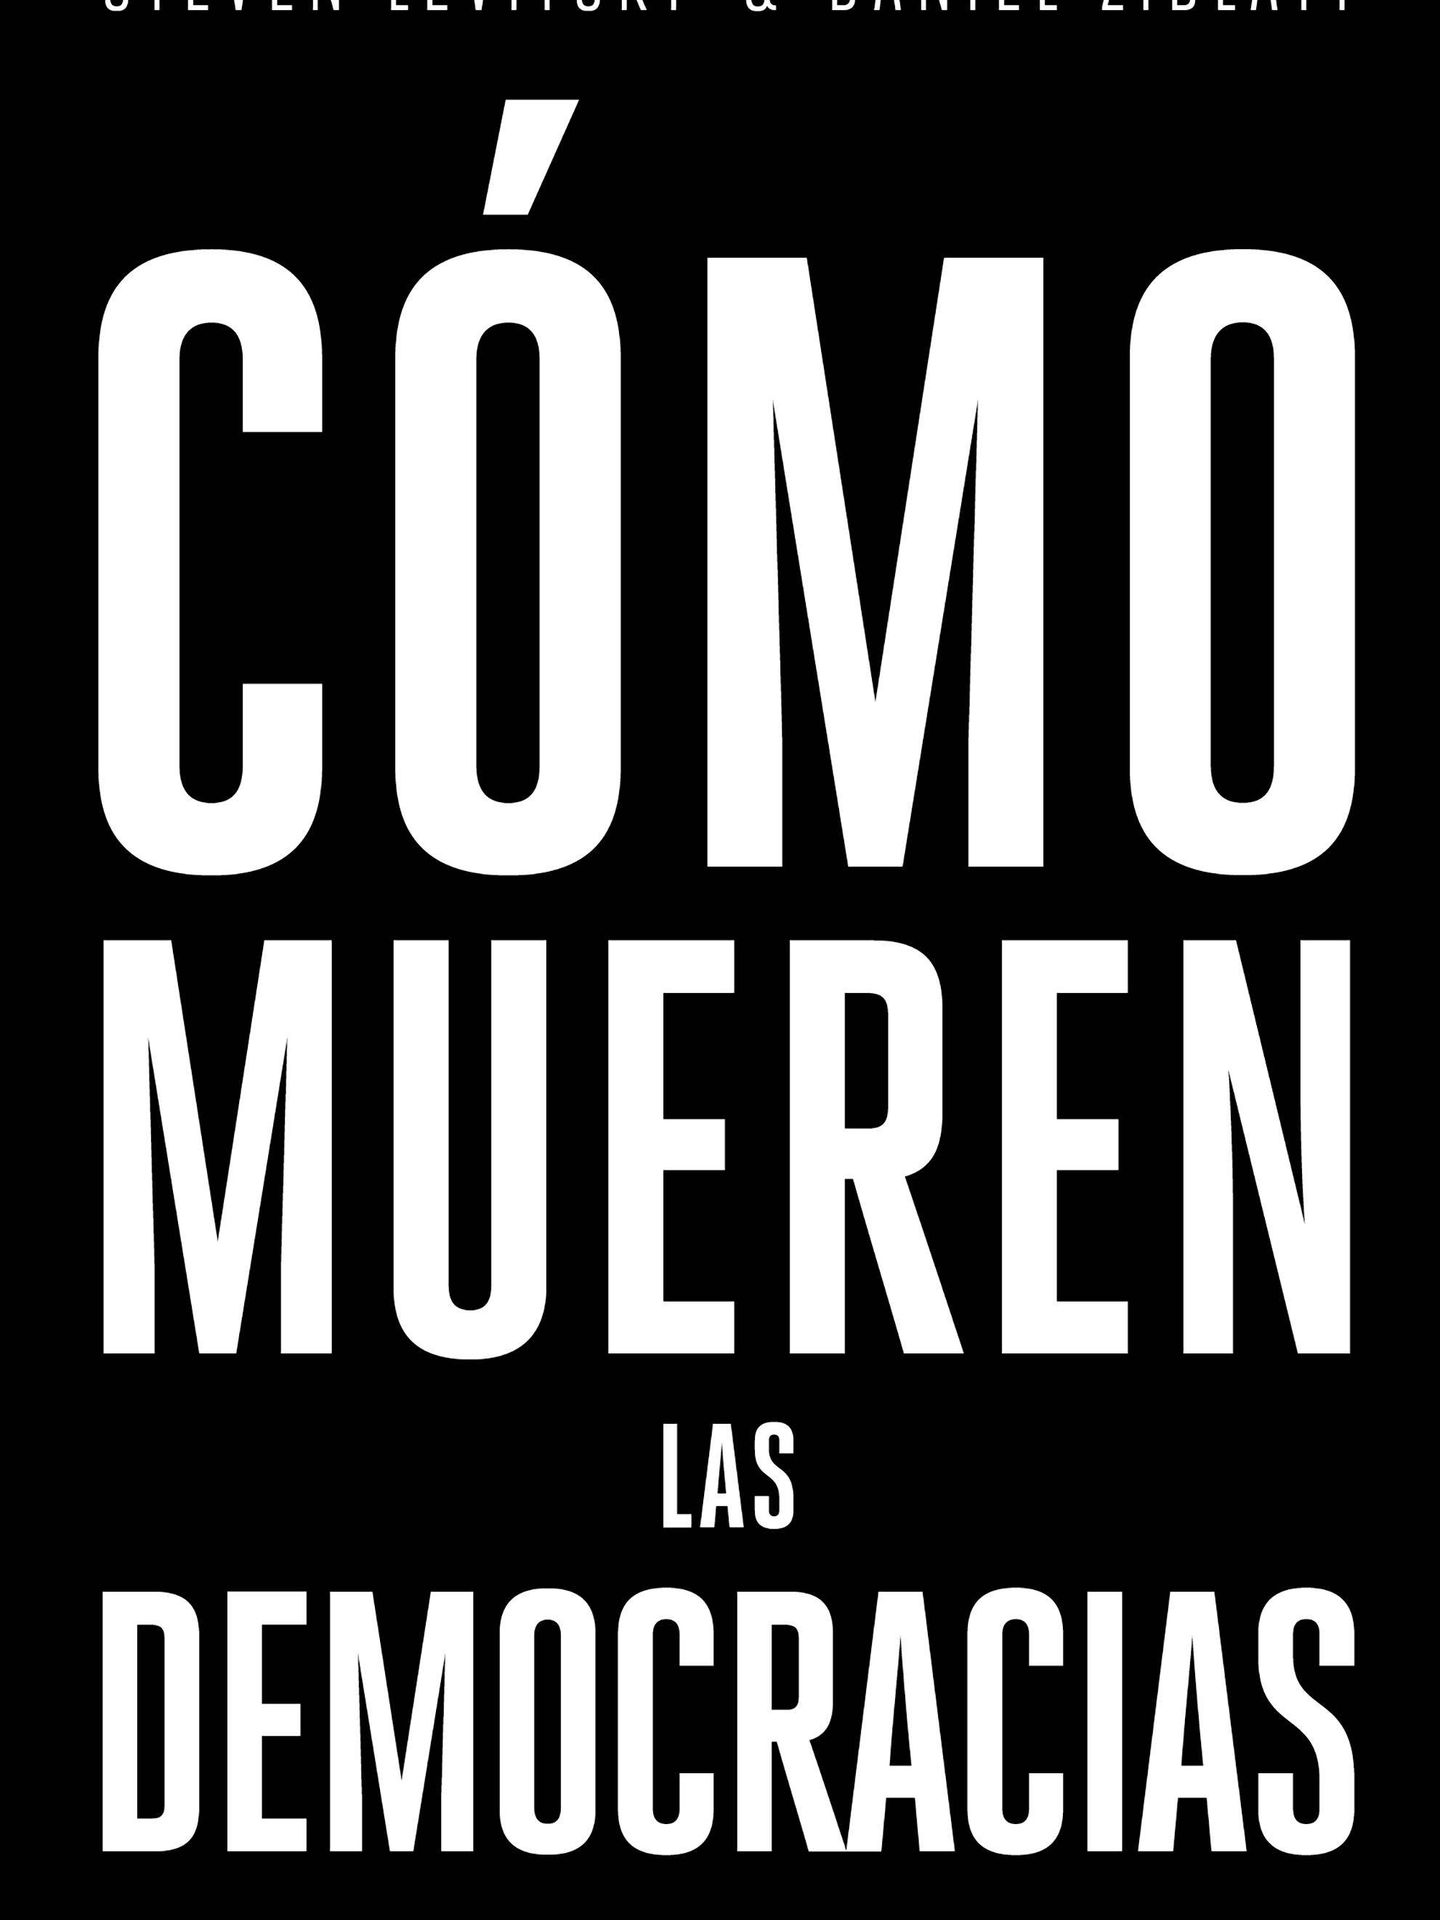 https://cms.elconfidencial.com/front/list/'C%C3%B3mo%20mueren%20las%20democracias'%20(Ariel).